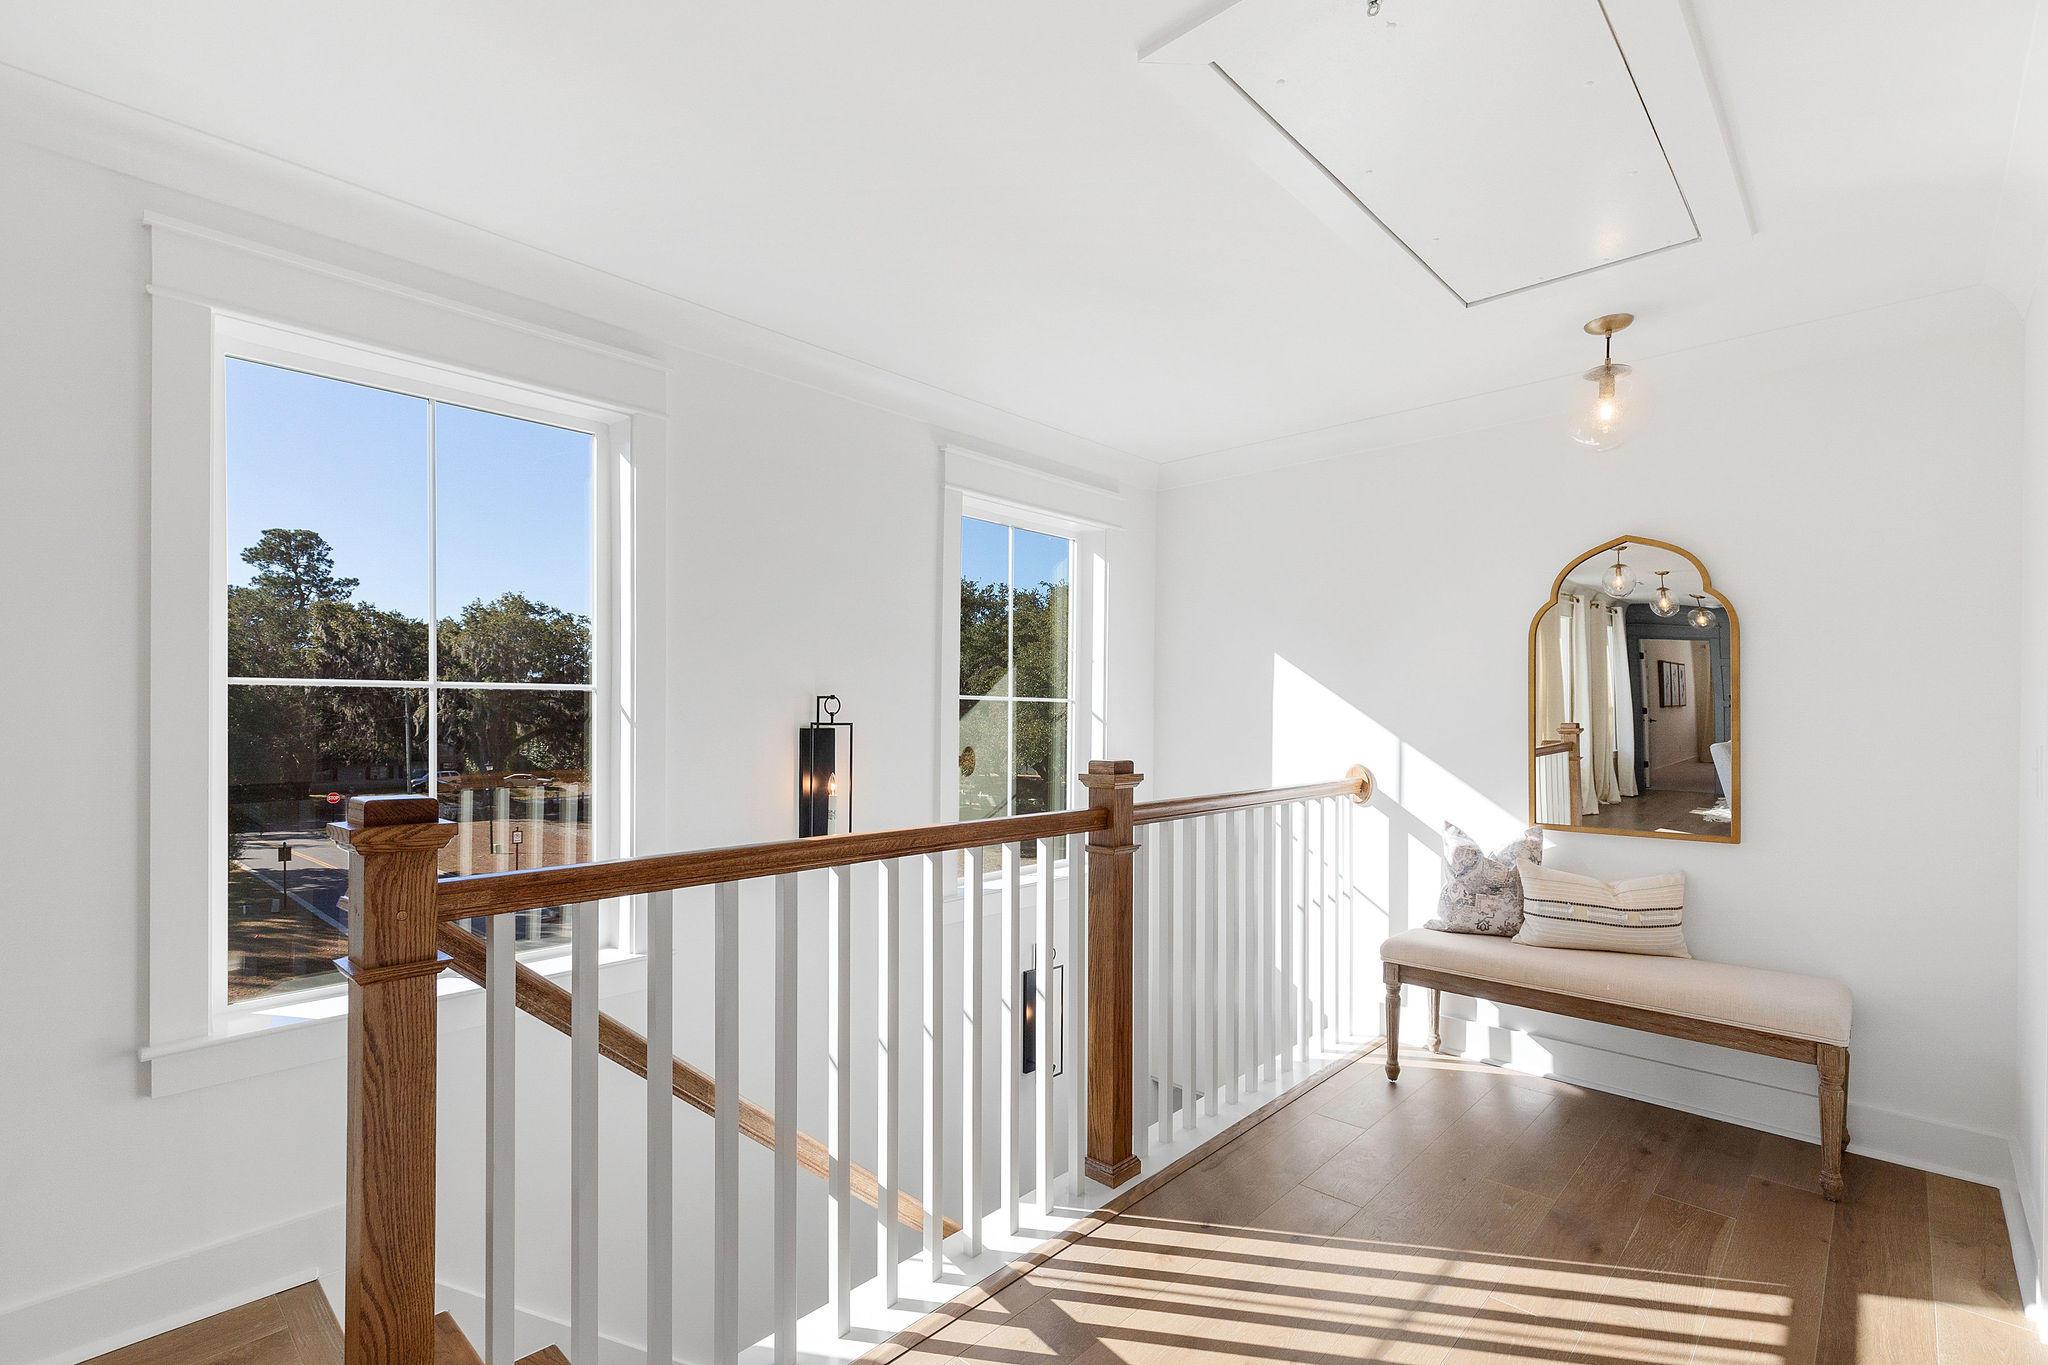 Avenue of Oaks Homes For Sale - 1027 Avenue Of Oaks, Charleston, SC - 8